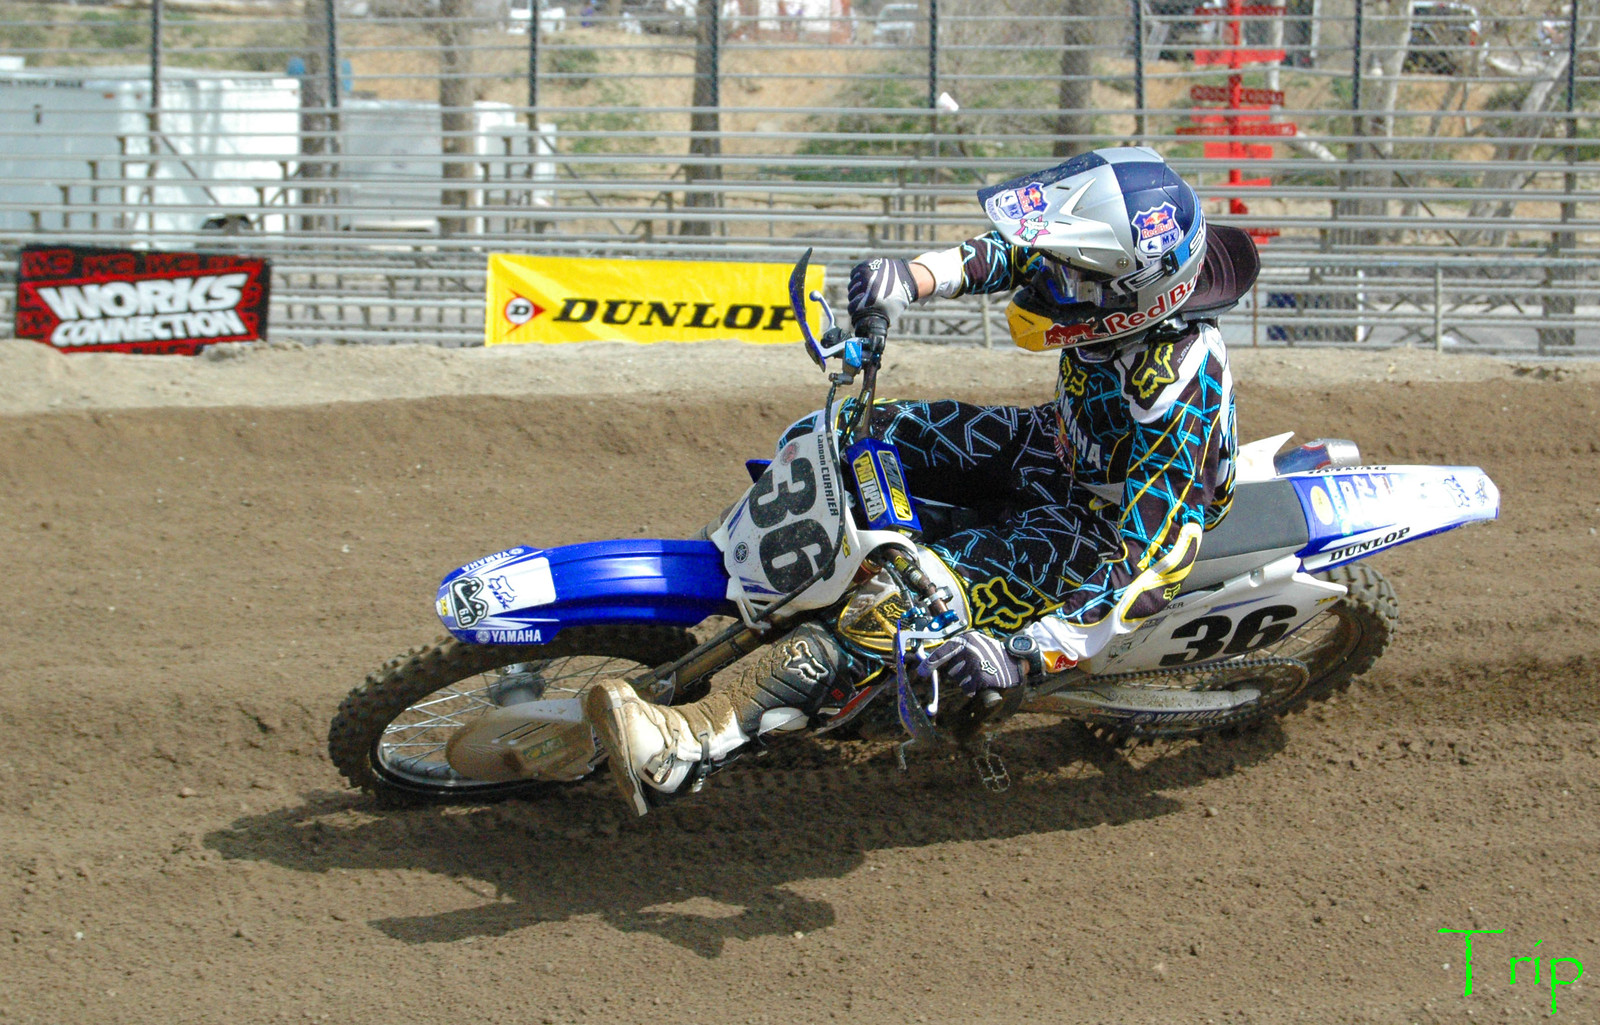 2-26-09 Glen Helen Pics - Trip - Motocross Pictures - Vital MX